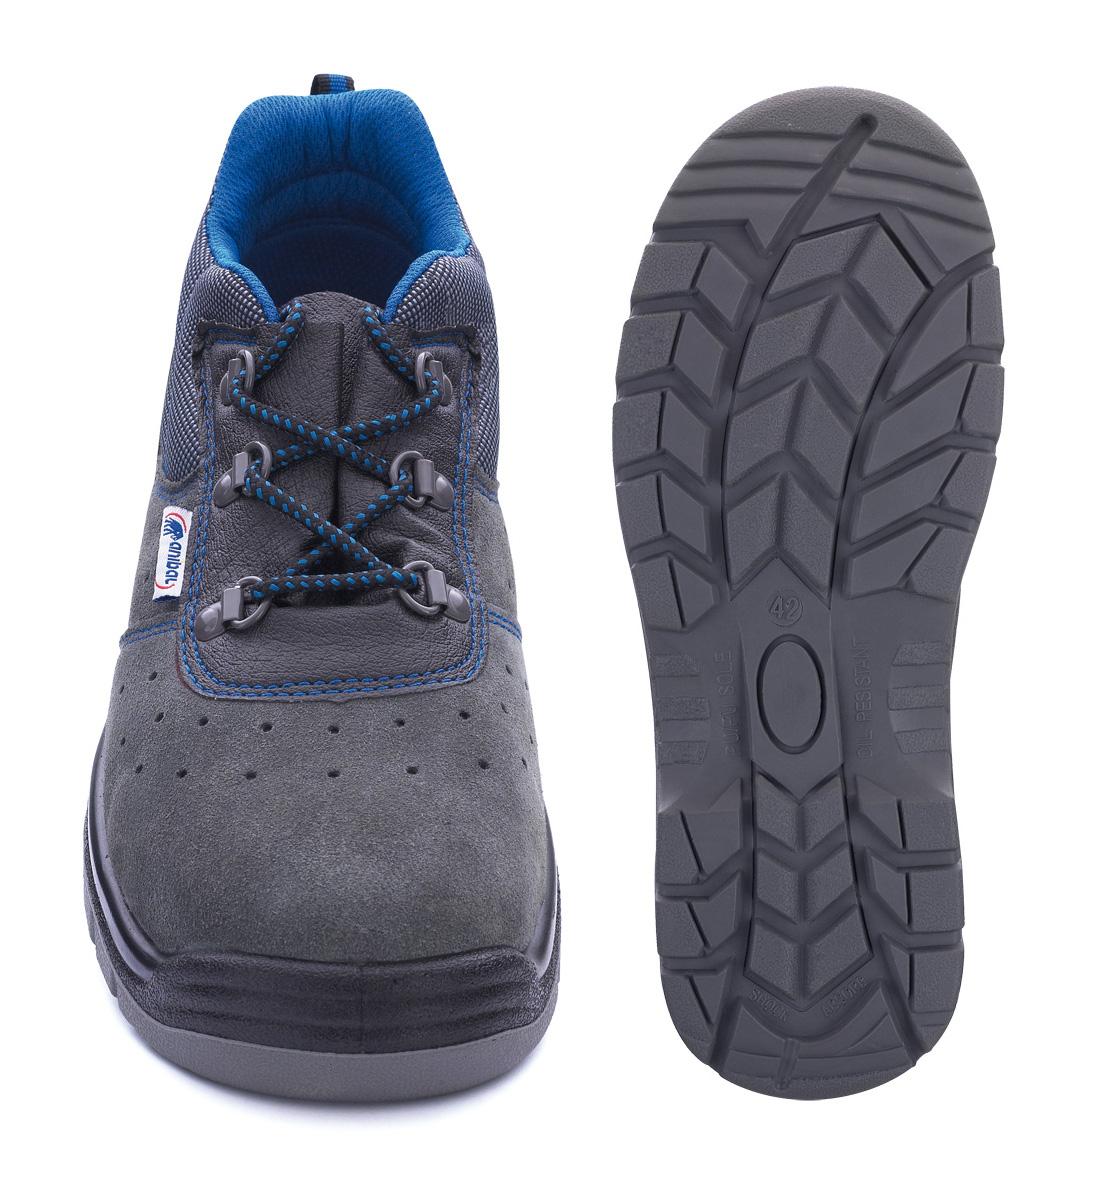 Protección Marca Chaussures de Basic Metal Produits securite Yf0w01